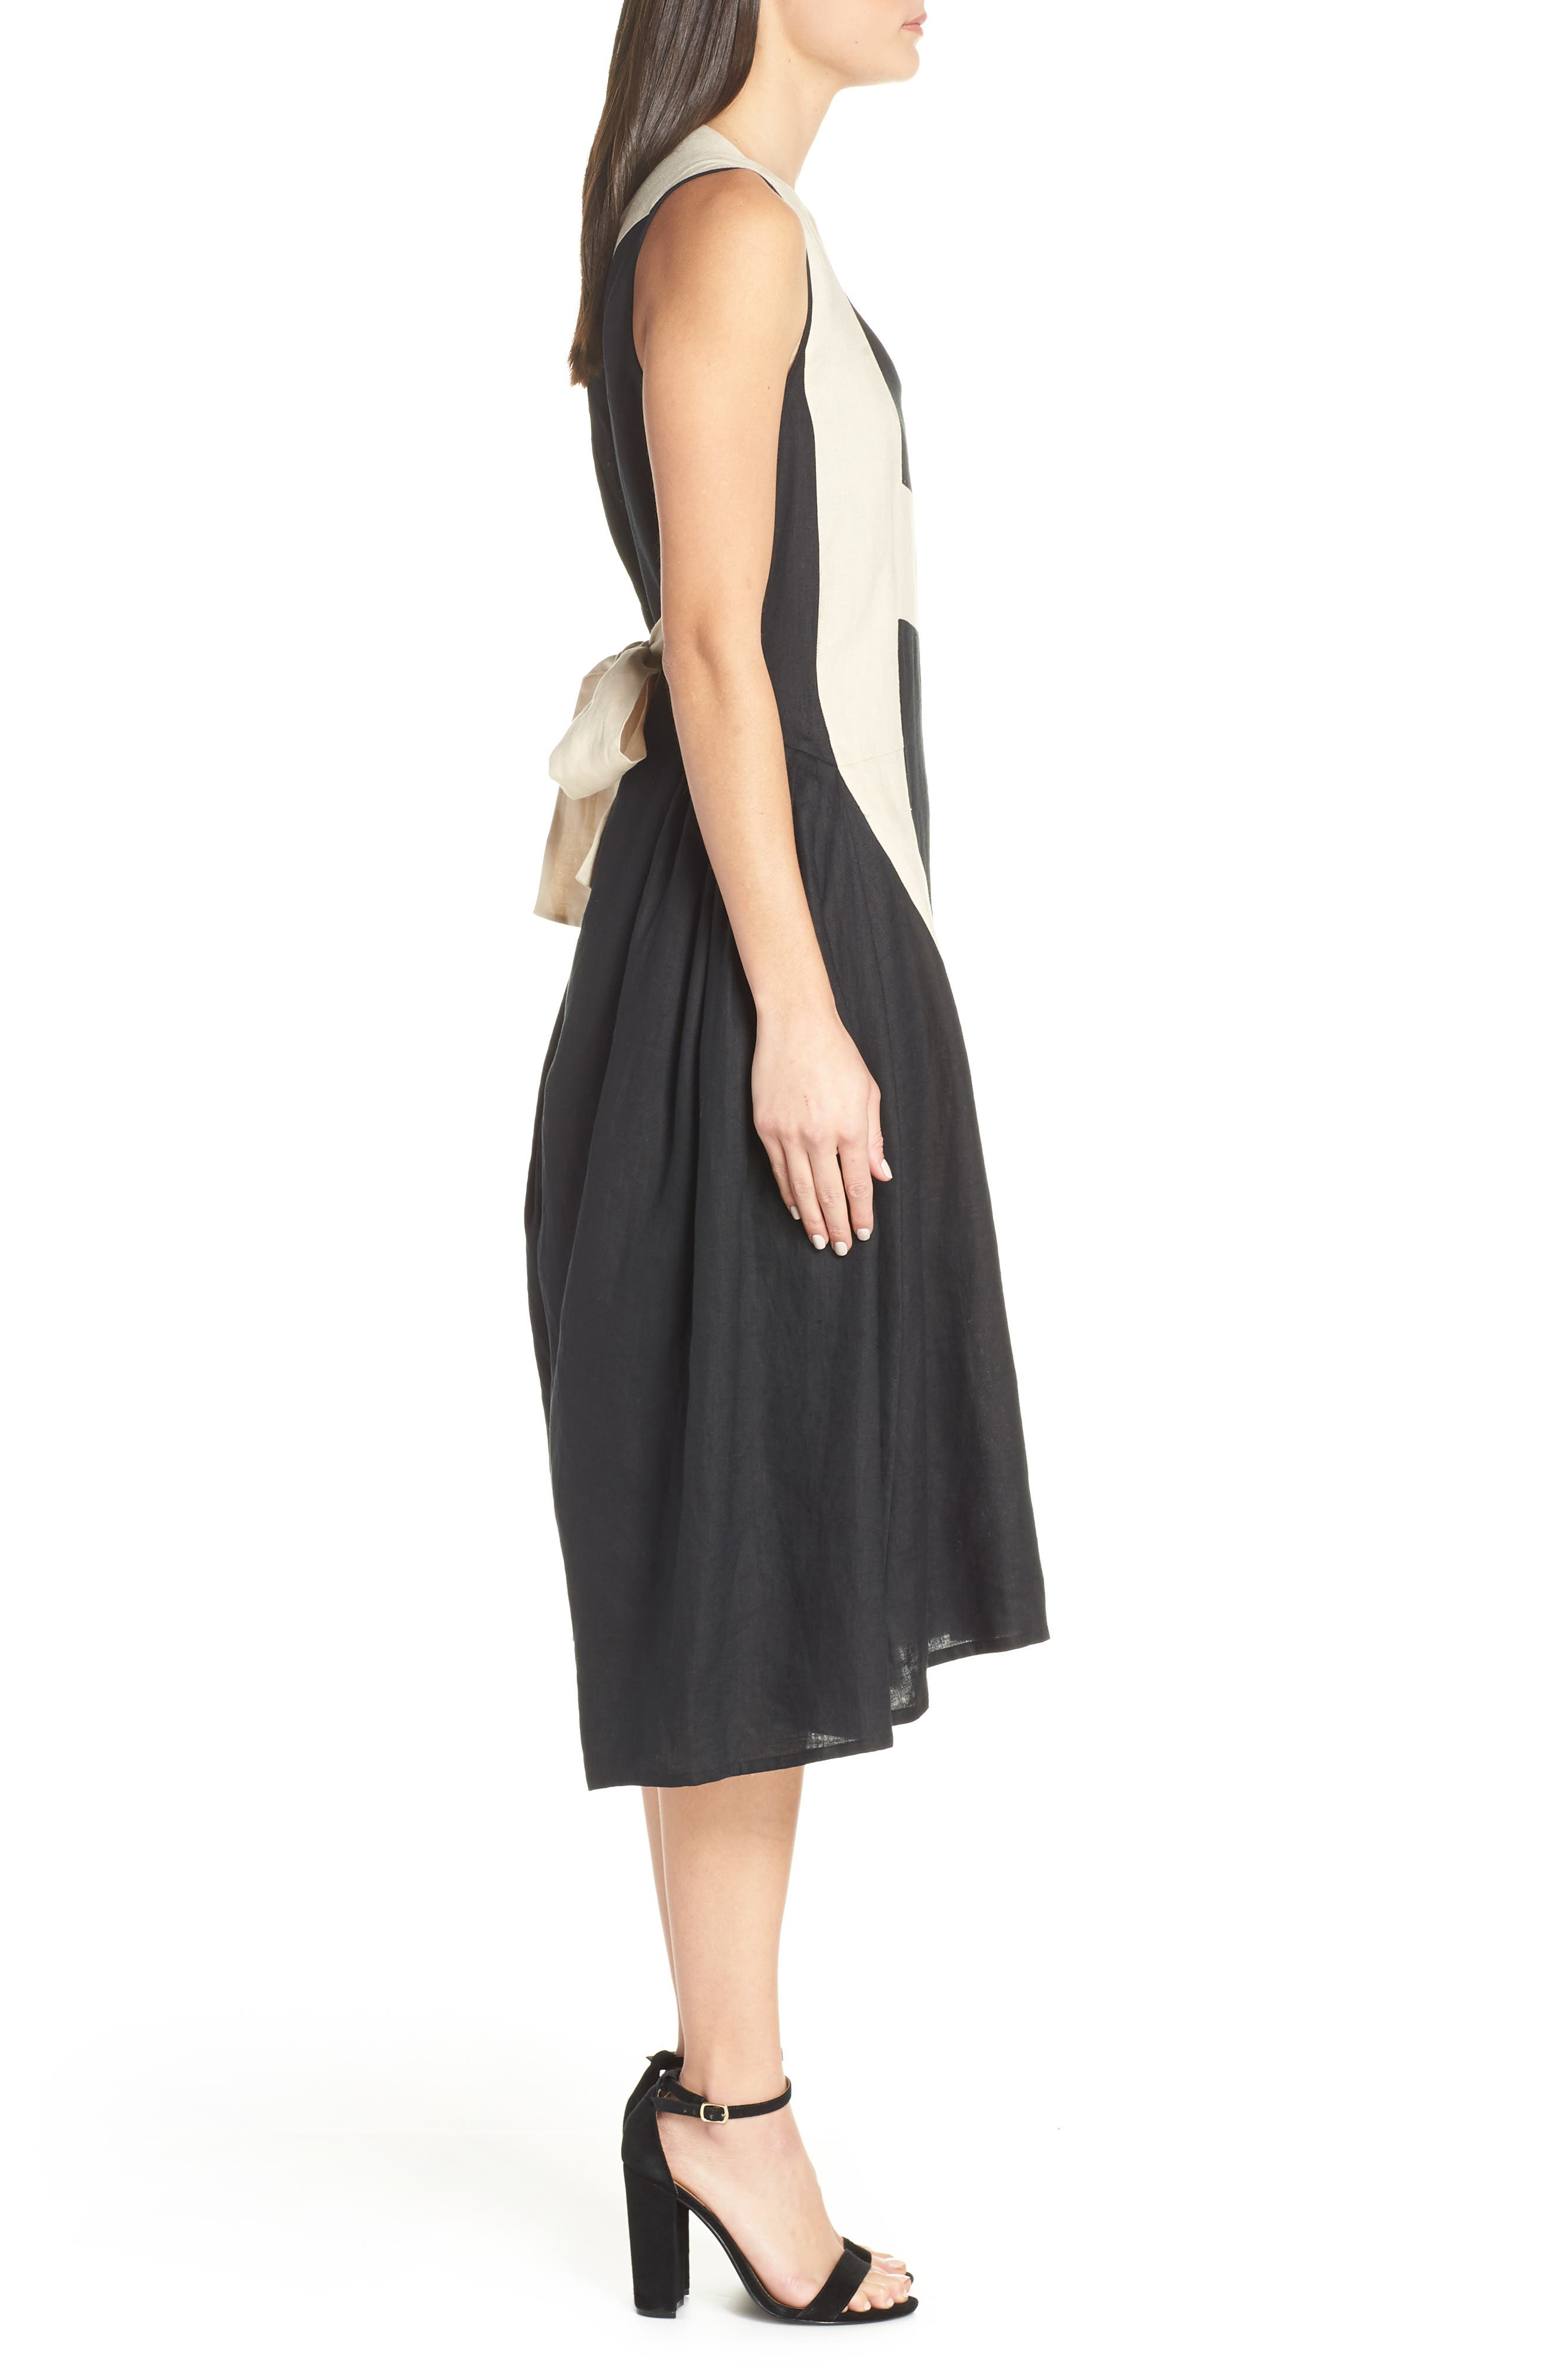 CAARA, Betha Colorblock Tie Back Dress, Alternate thumbnail 4, color, 001